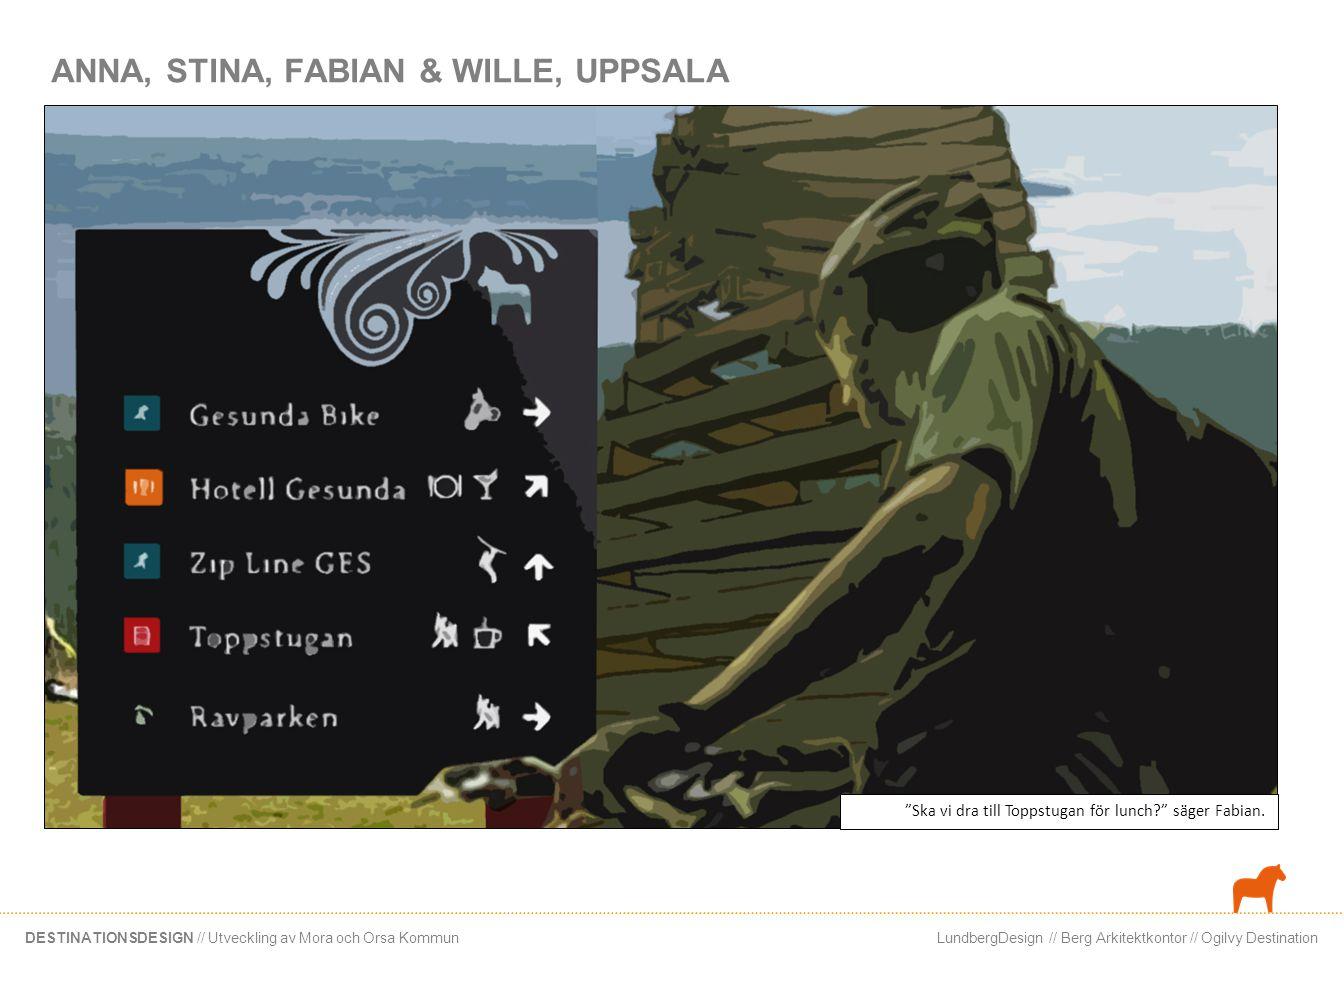 ANNA, STINA, FABIAN & WILLE, UPPSALA